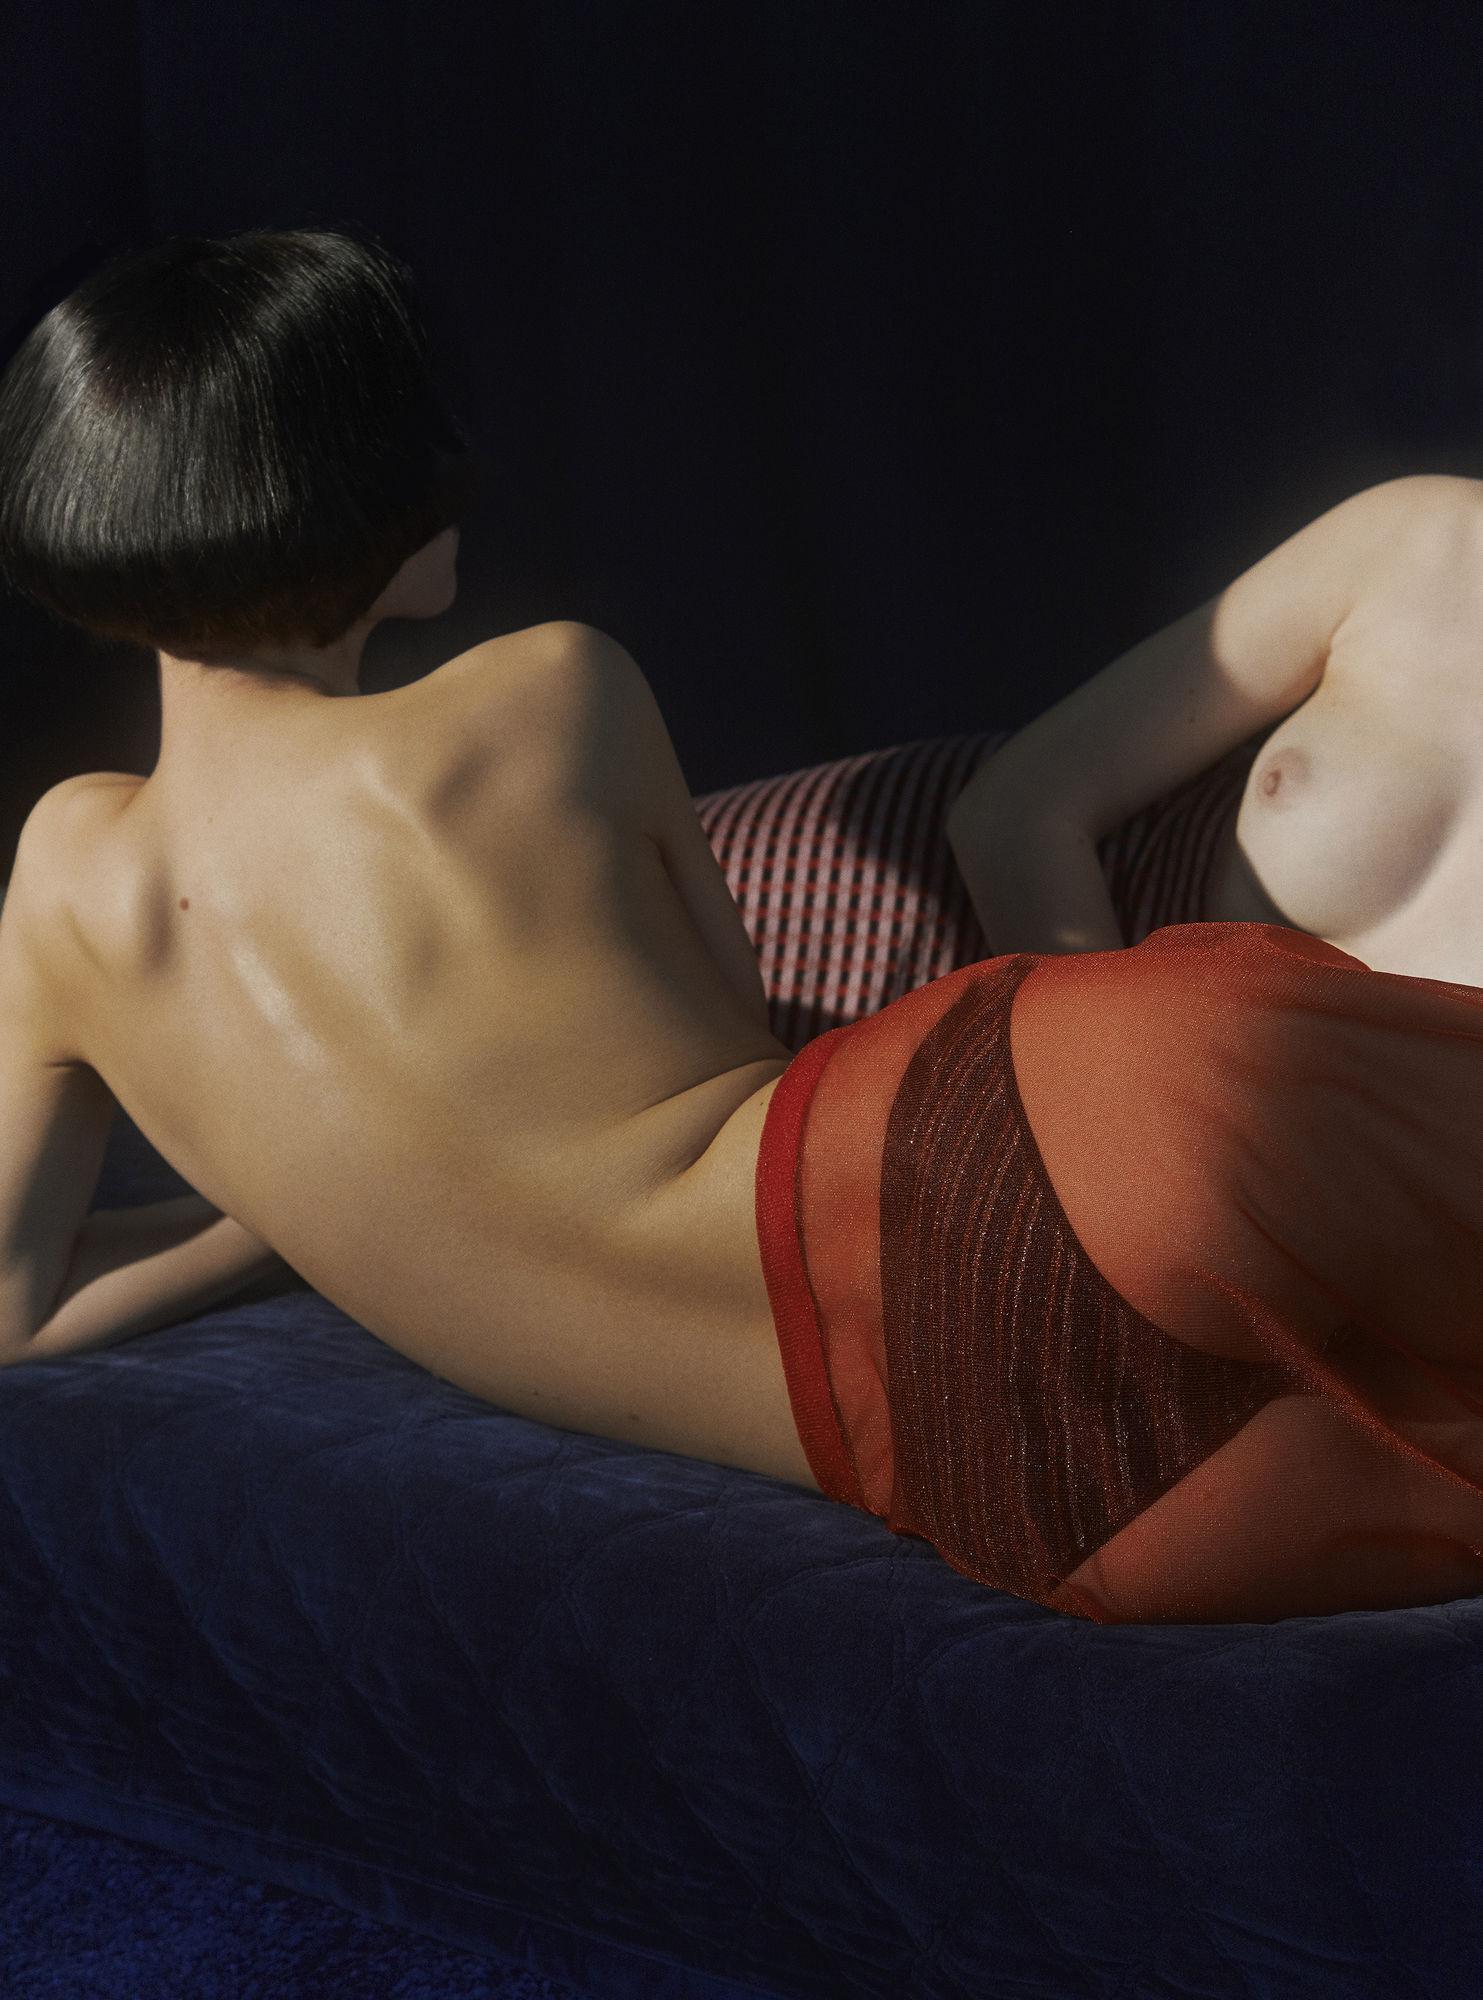 'Dark' Styling by Christina Holzum c/o KLAUS STIEGEMEYER